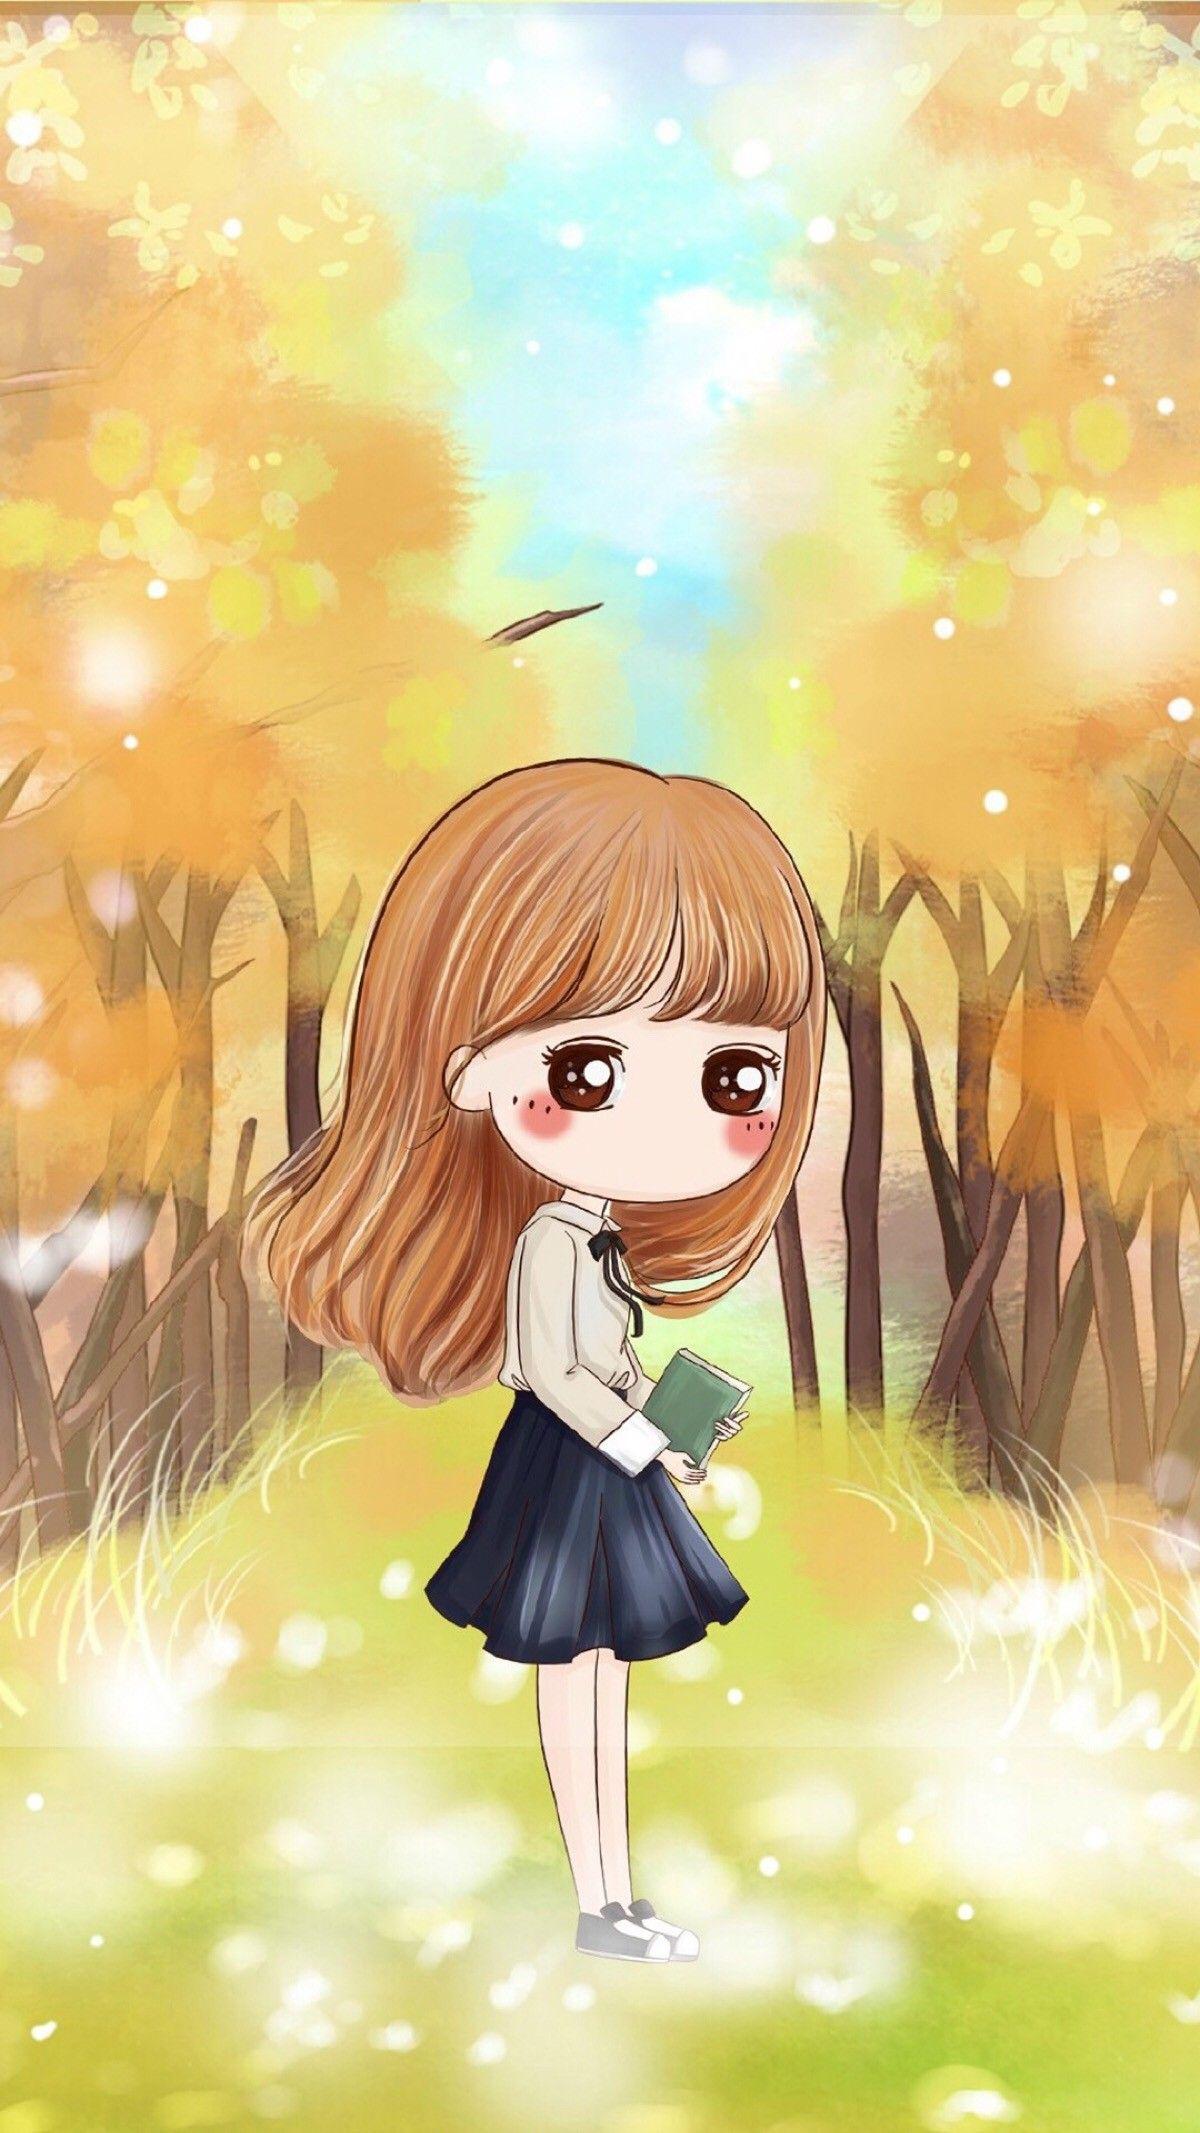 Pin by ROSE on Girl Cute girl wallpaper, Cute kawaii